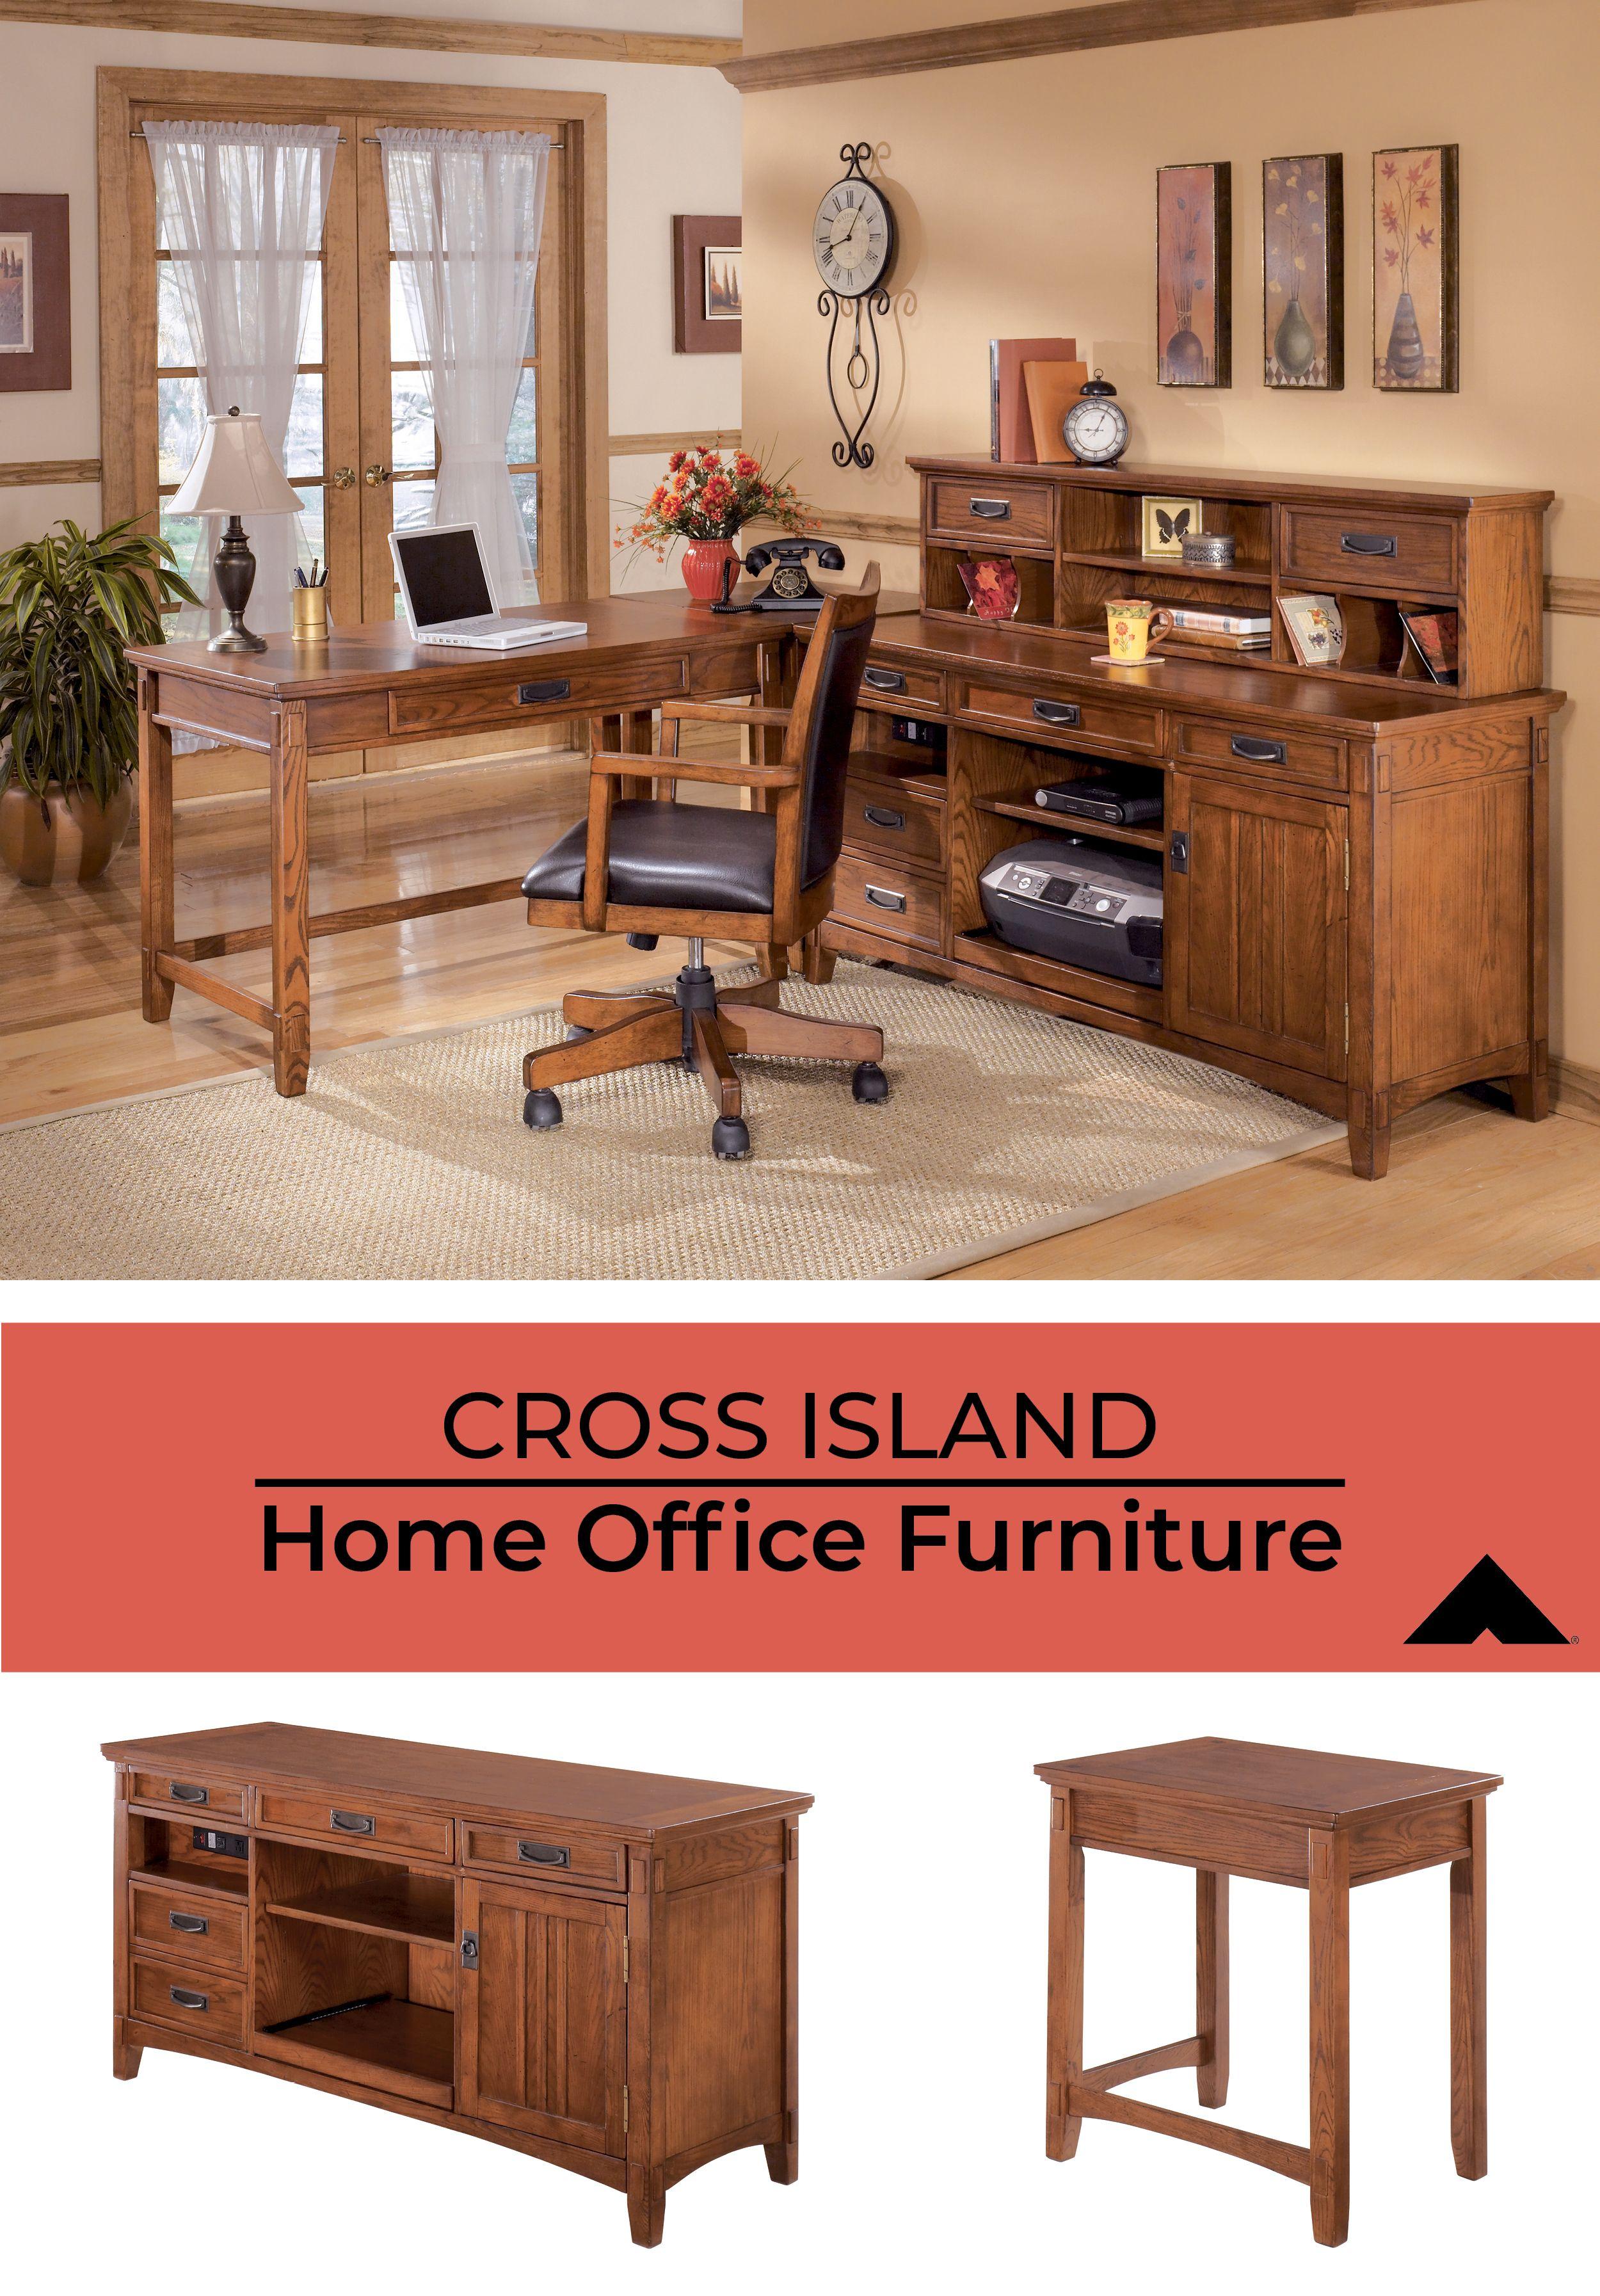 Cross Island Medium Brown Home Office Furniture By Ashley Furniture Ashleyfurniture Homeoffice Homedecor Desks Fur Home Home Office Furniture Furniture